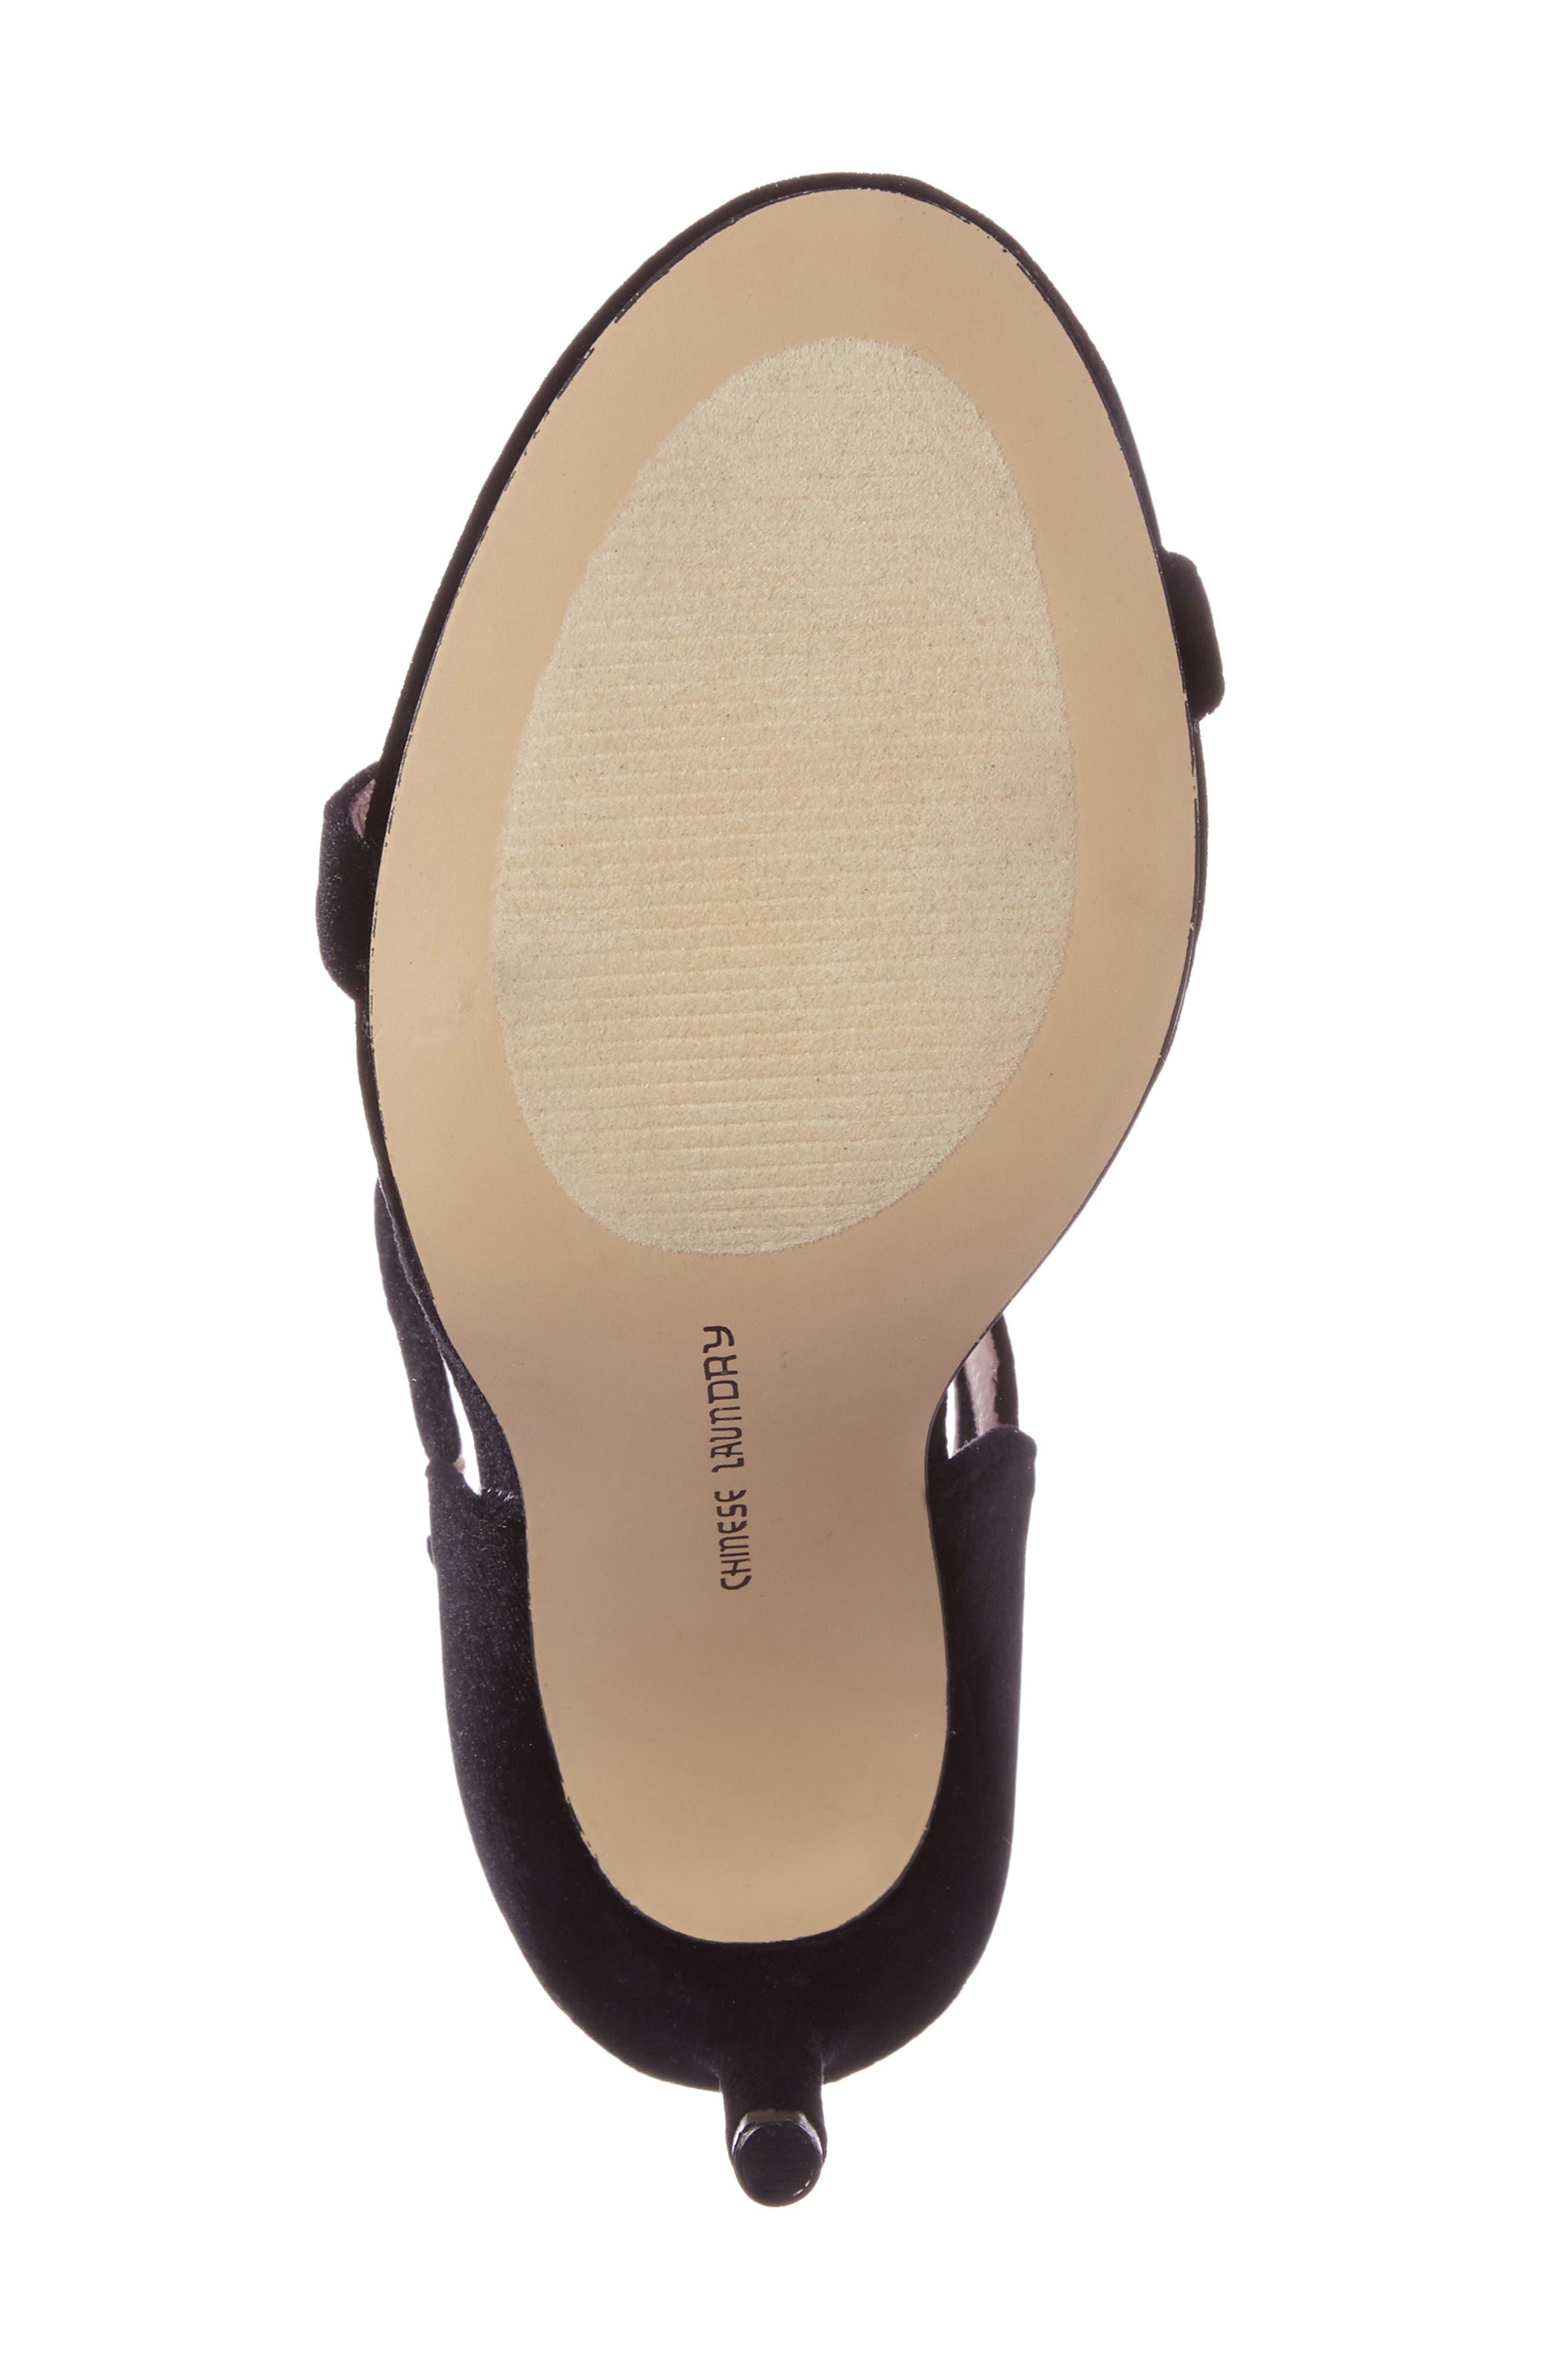 Lavelle Ankle Strap Sandal,                             Alternate thumbnail 5, color,                             001